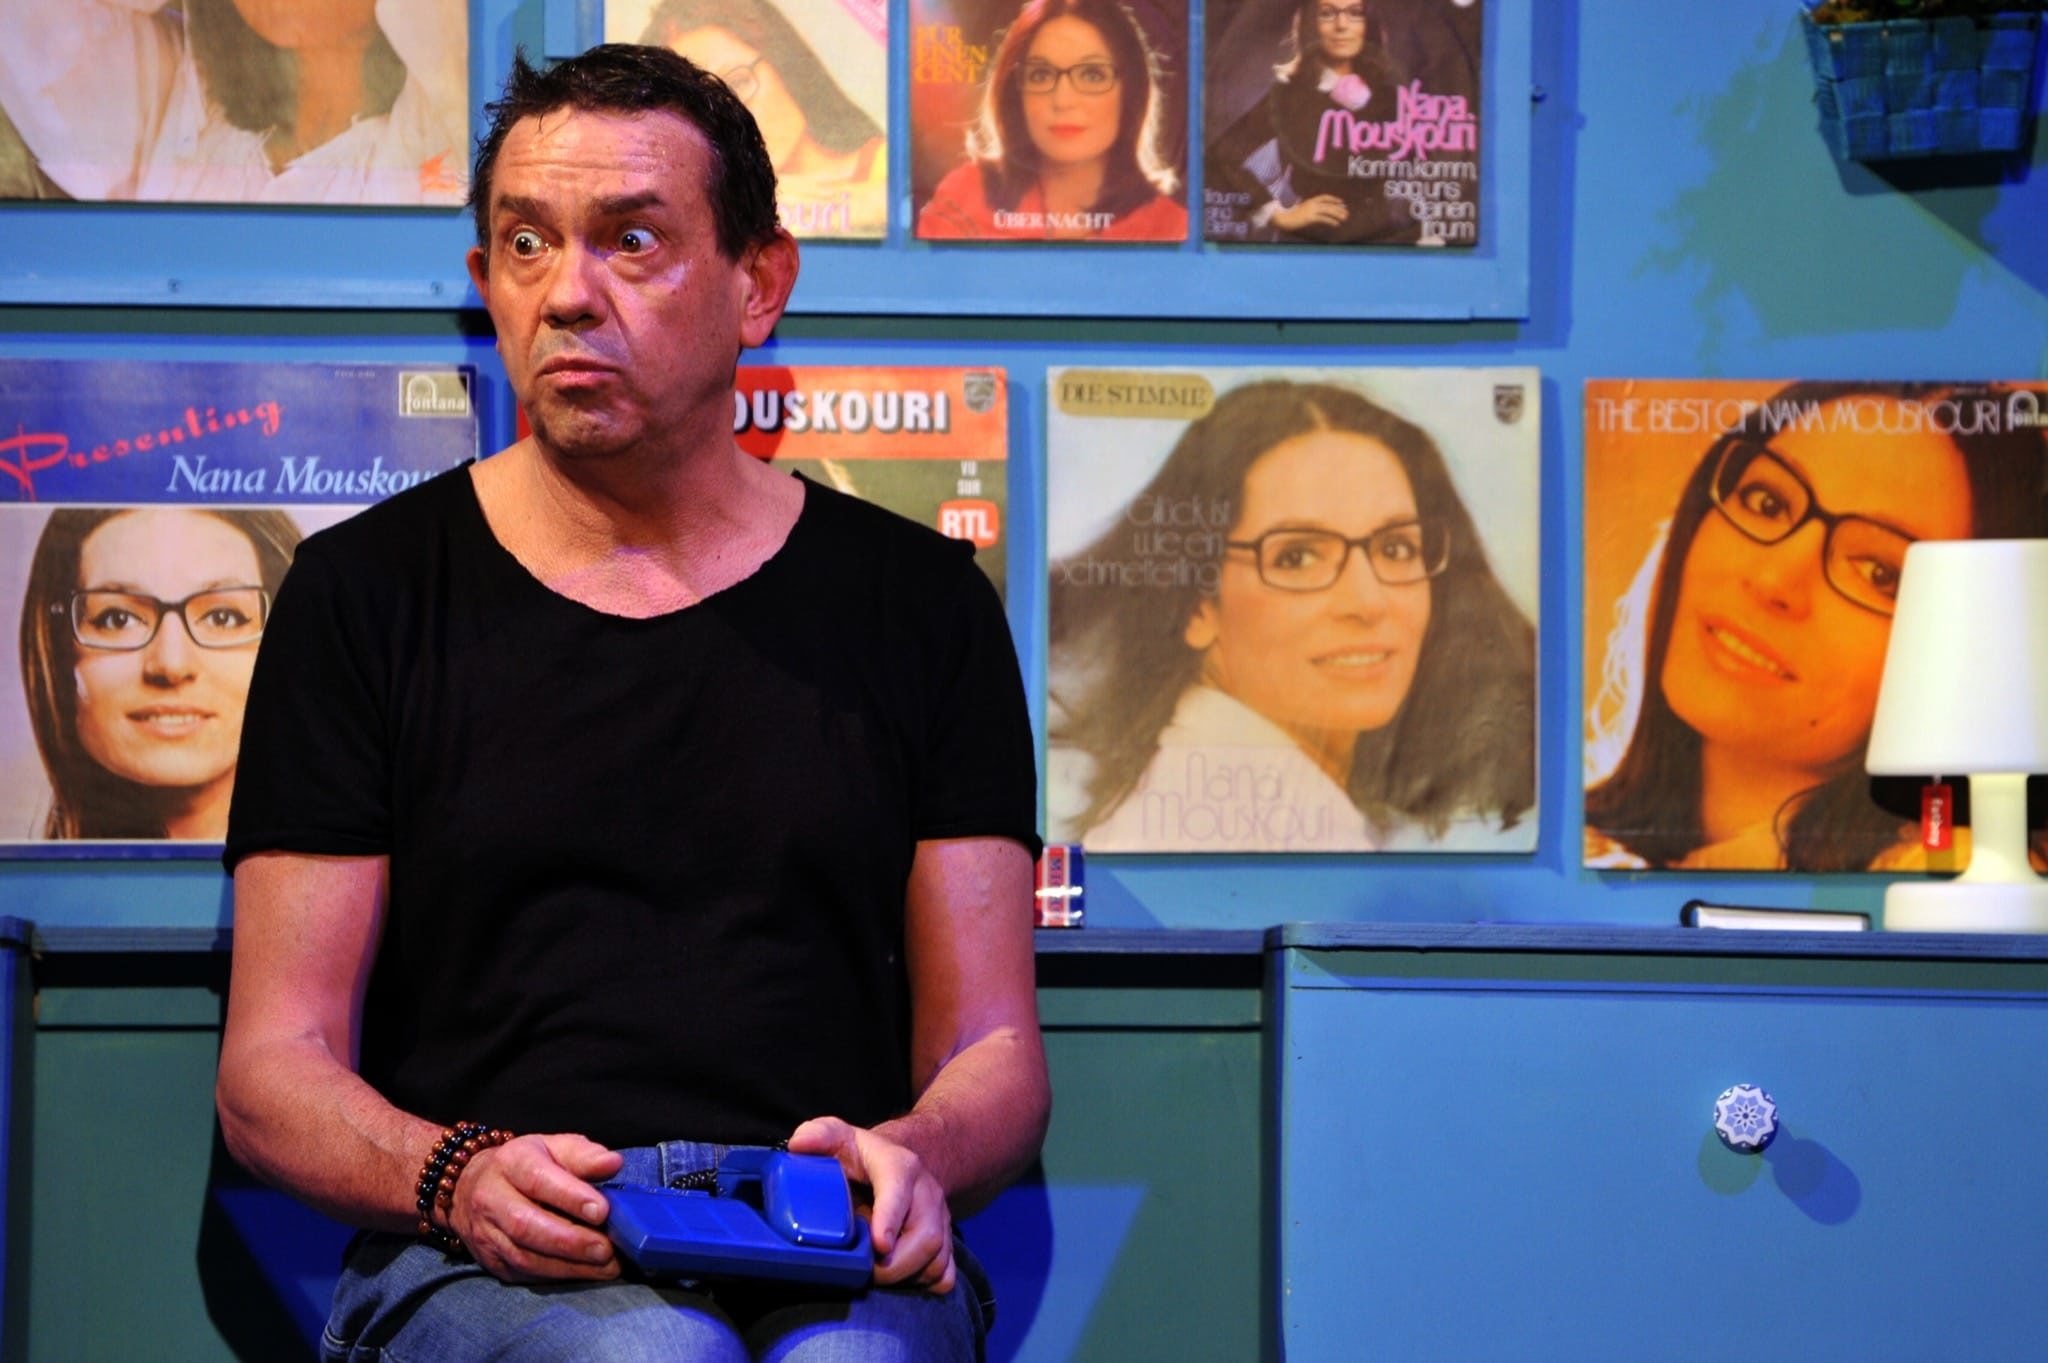 Quand je serai grand, je serai Nana Mouskouri par Virginie Lemoine image théâtre